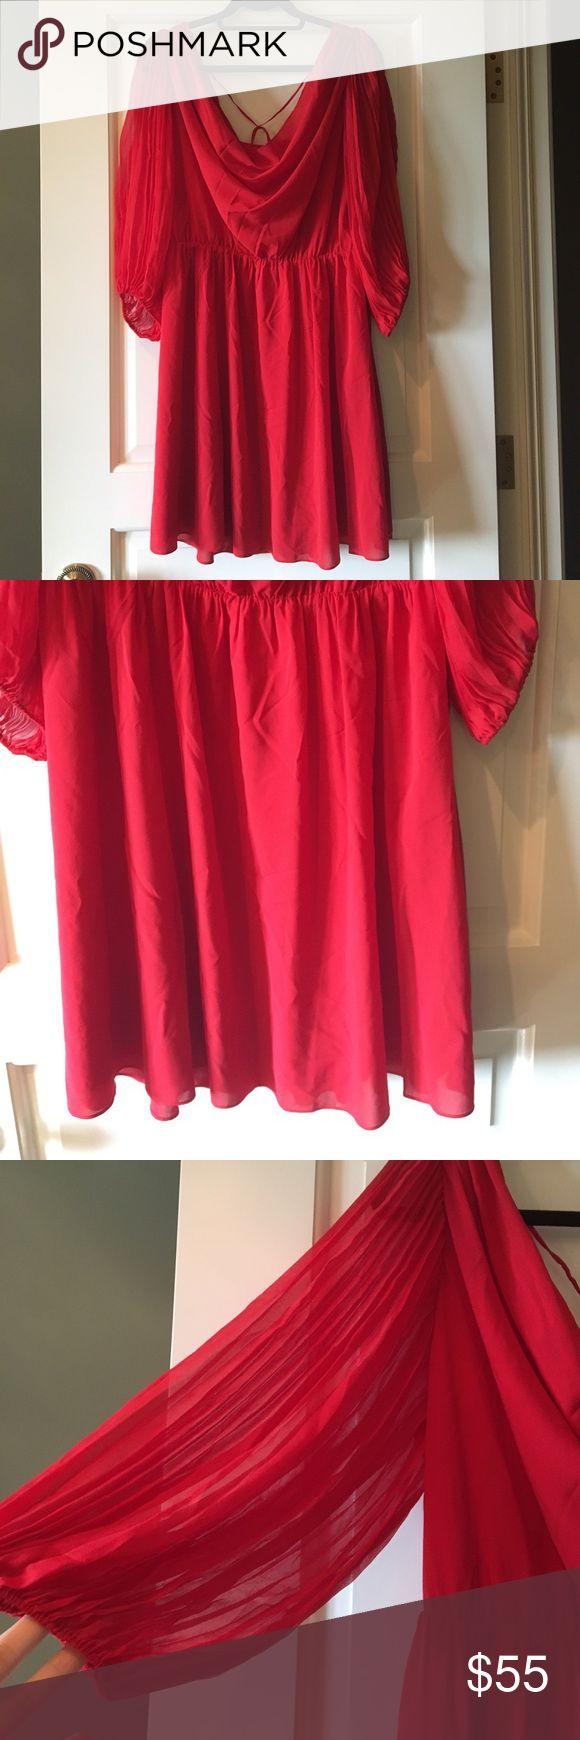 Alice + Olivia Red Chiffon Dress Alice + Olivia red chiffon, pleated sleeve, elastic waist dress! Fully lined, tie back along shoulder blades! Alice & Olivia Dresses